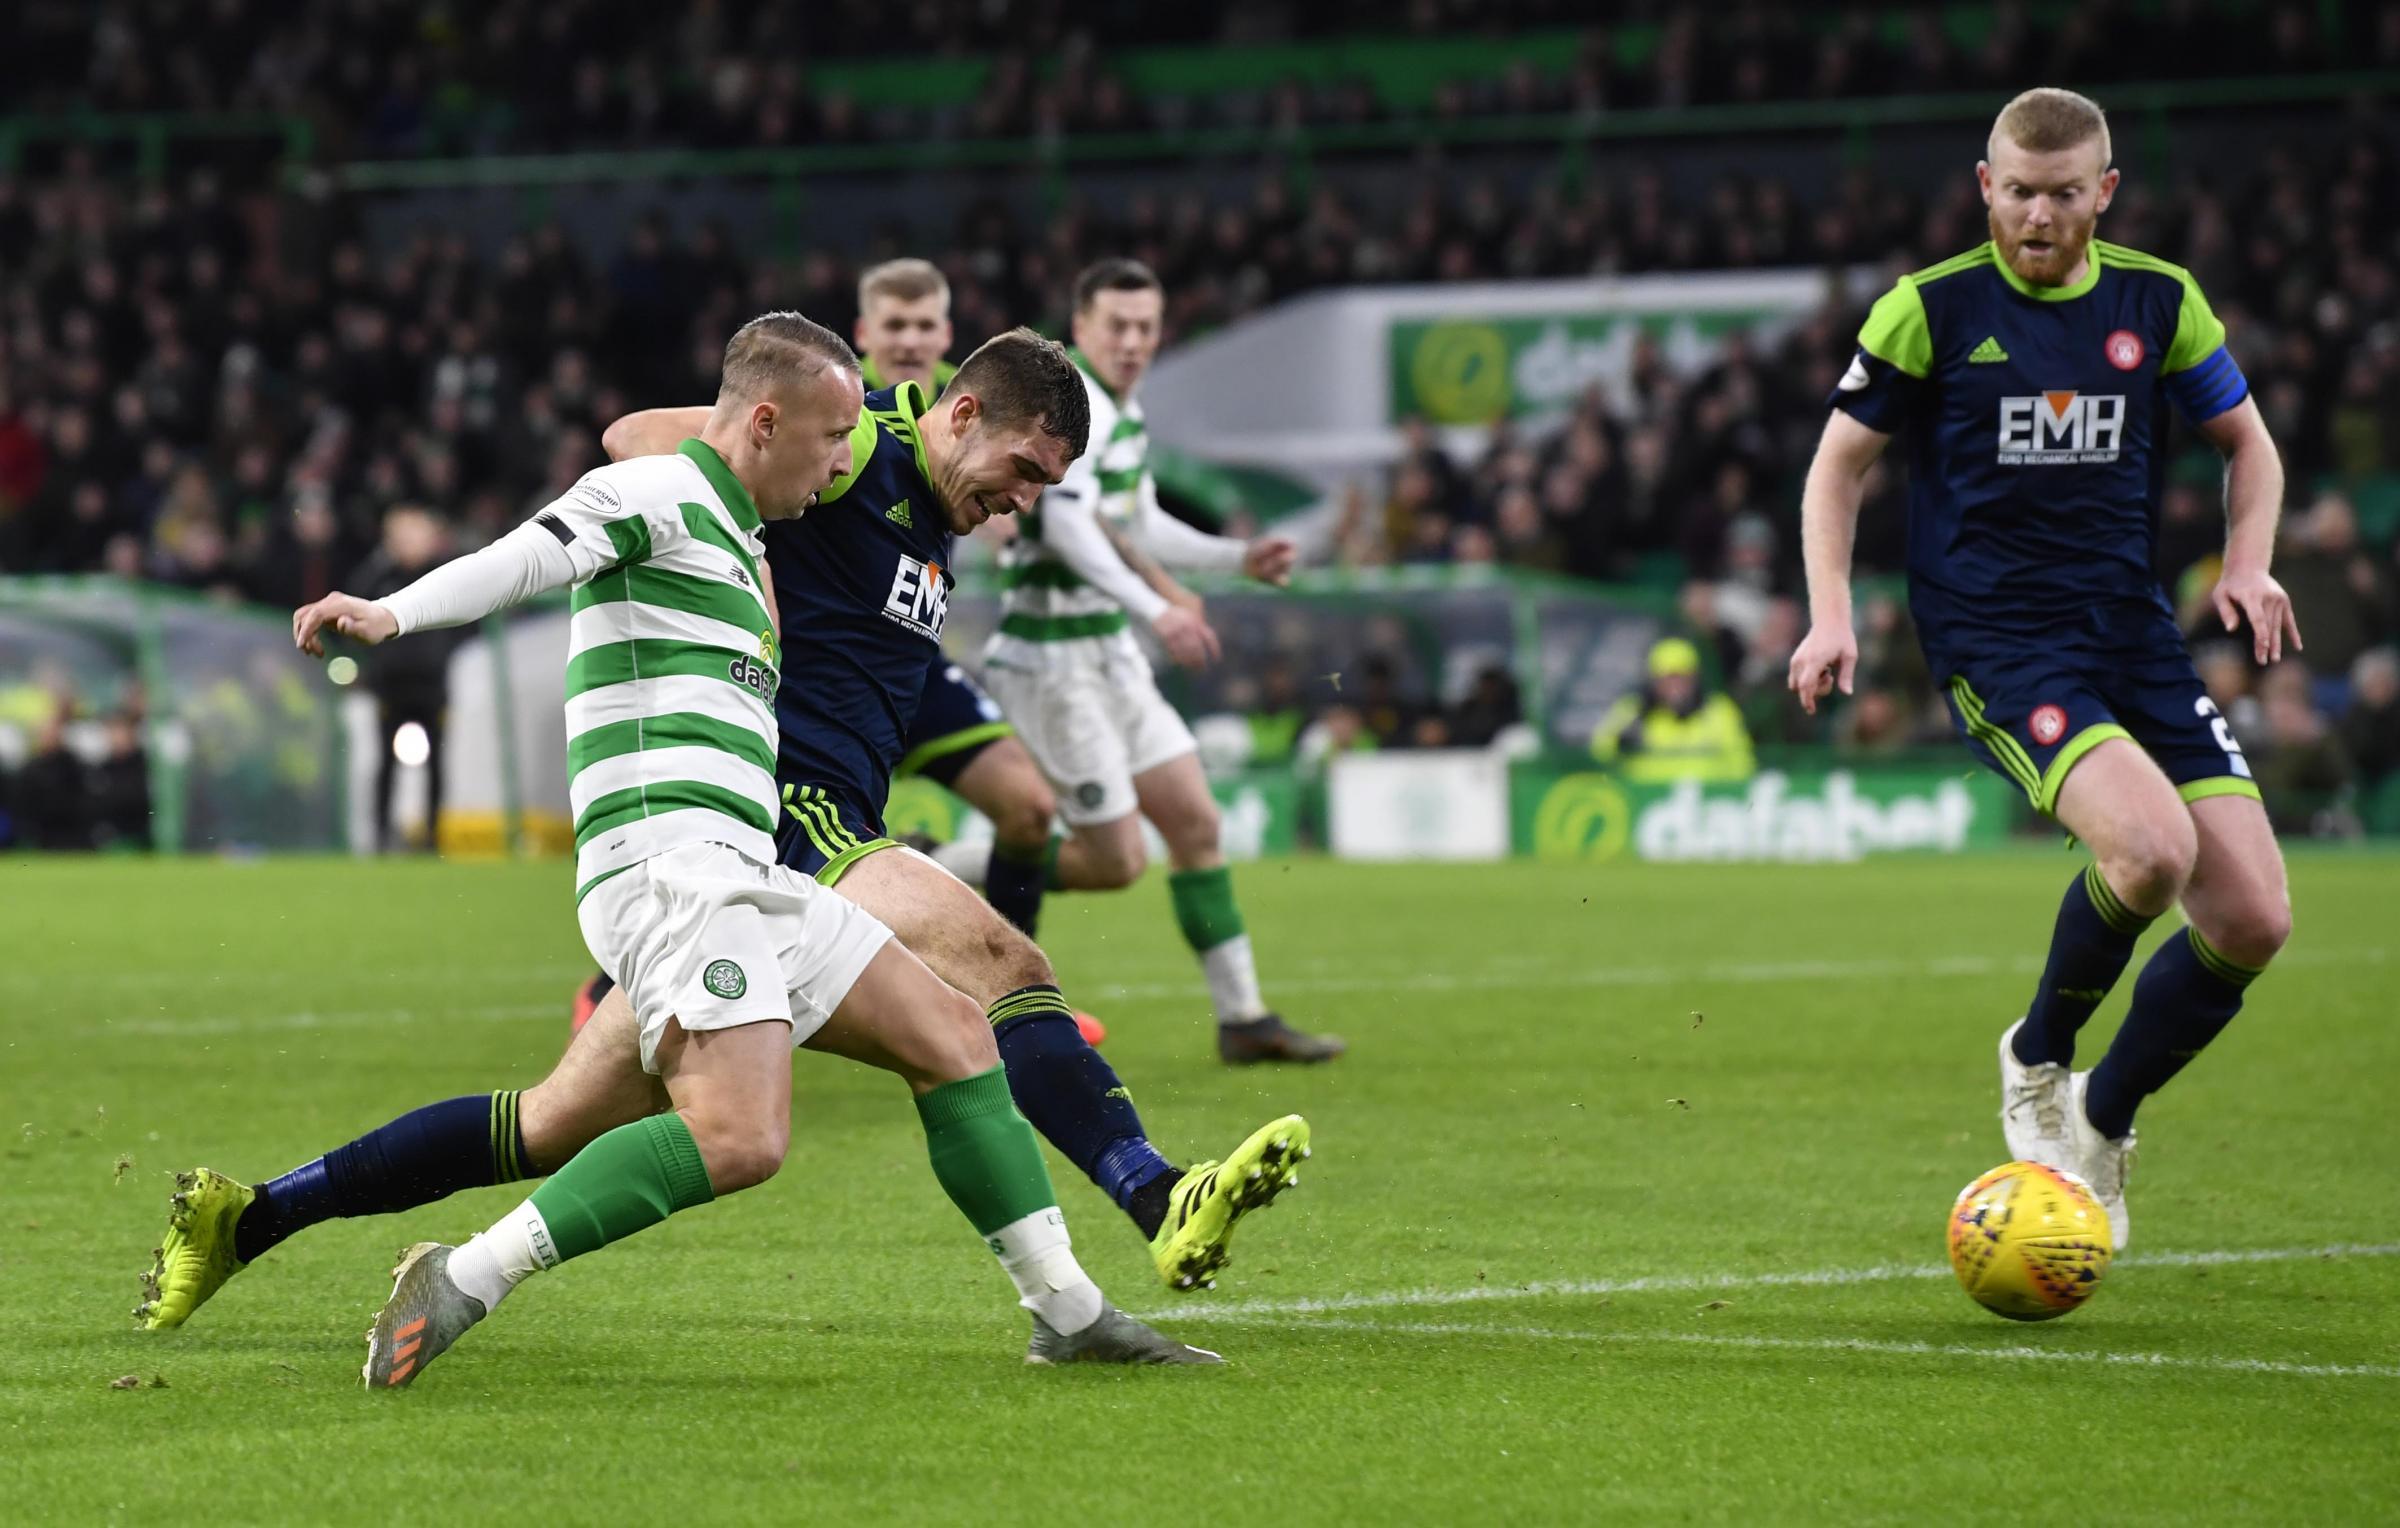 Celtic v Hamilton: TV times, kick-off, odds and live stream details